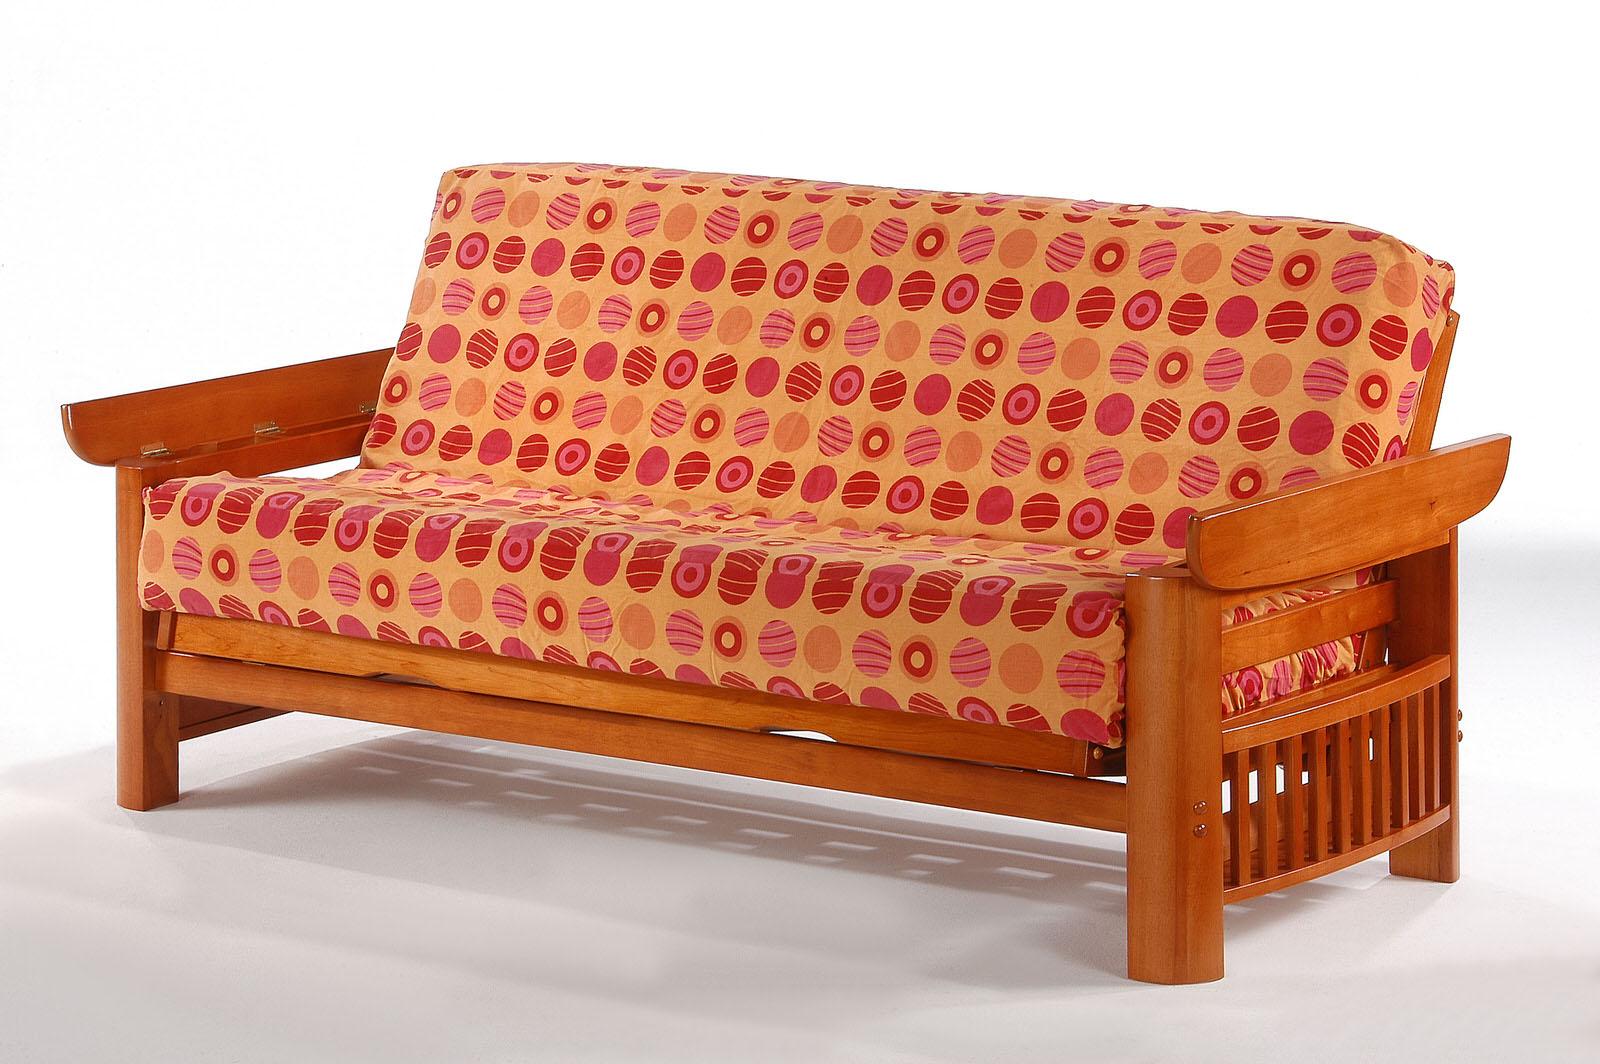 cotton cloud futons  portofino standard futon frame by nightu0026day furniture futons portland oregon   furniture shop  rh   ekonomikmobilyacarsisi